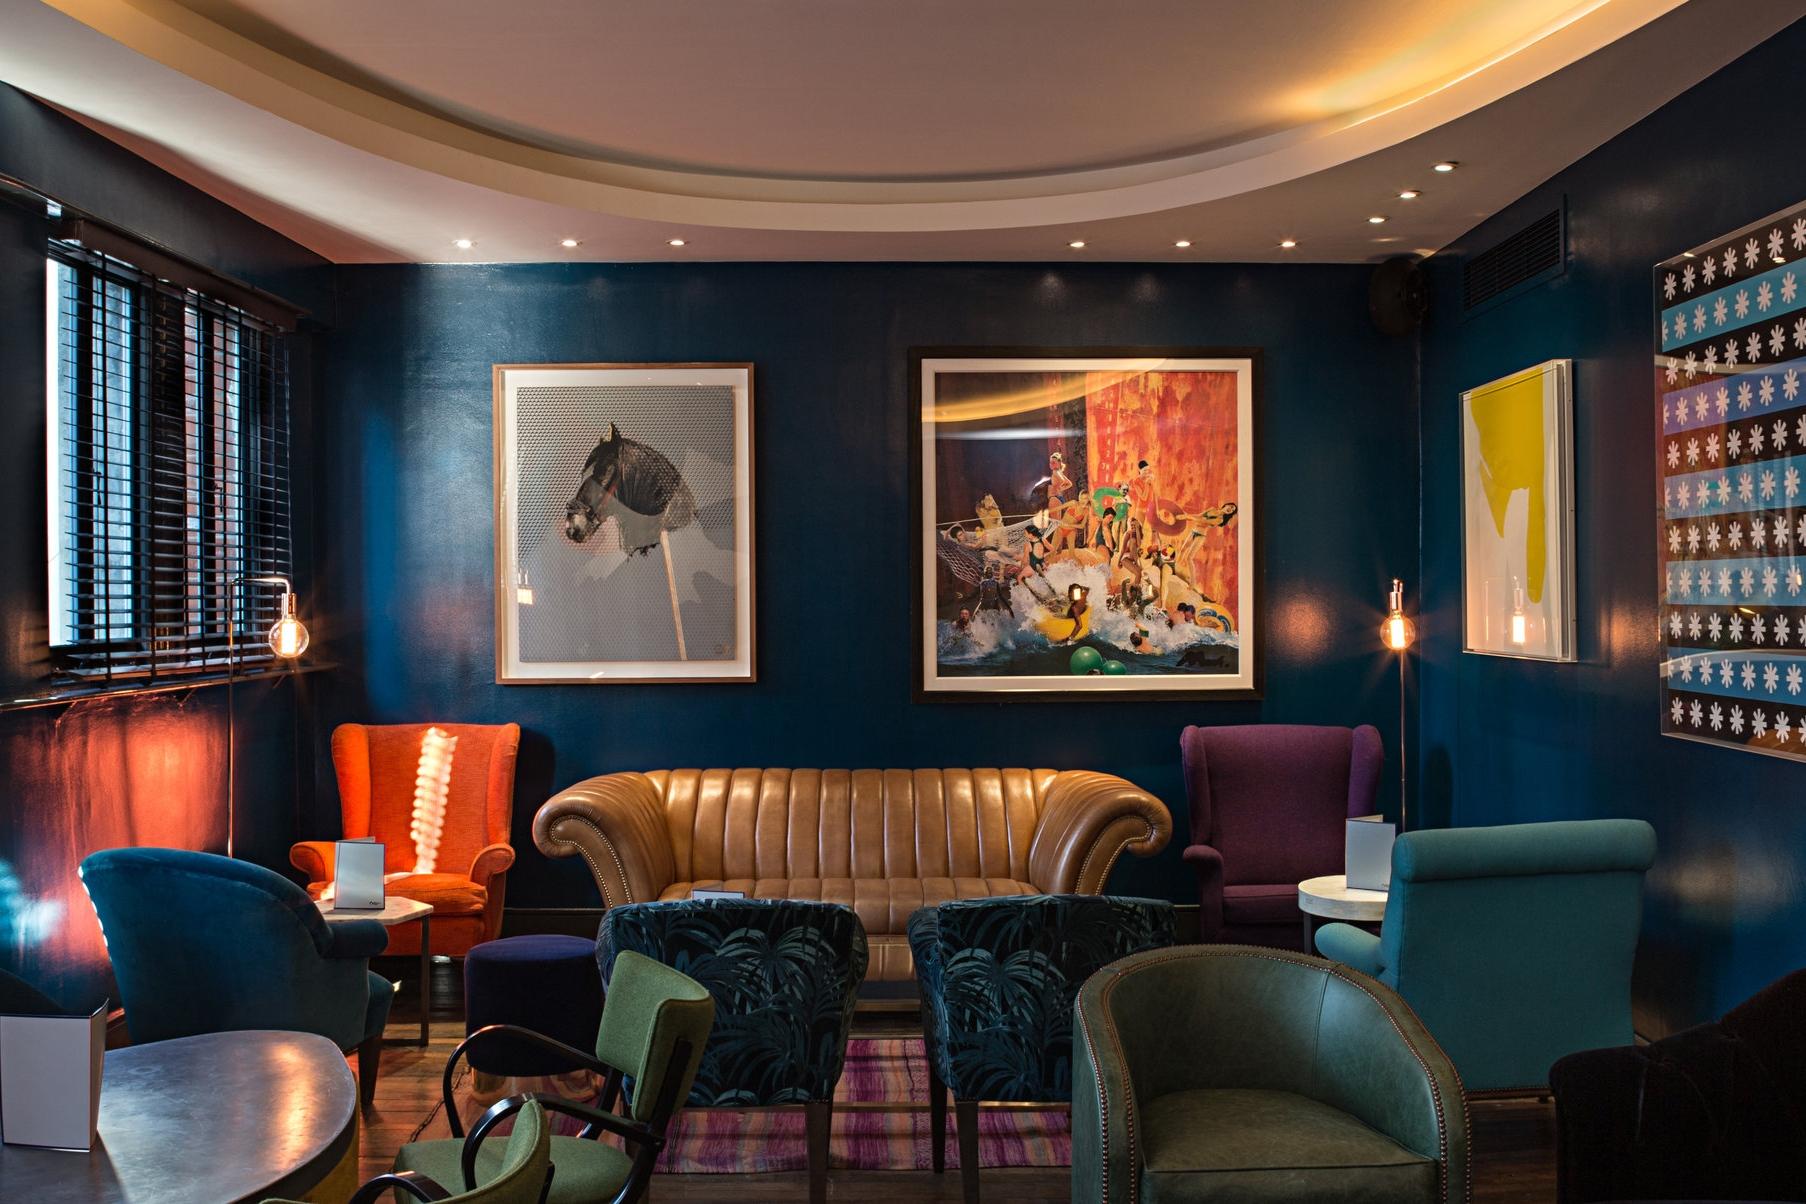 London | The Groucho Club